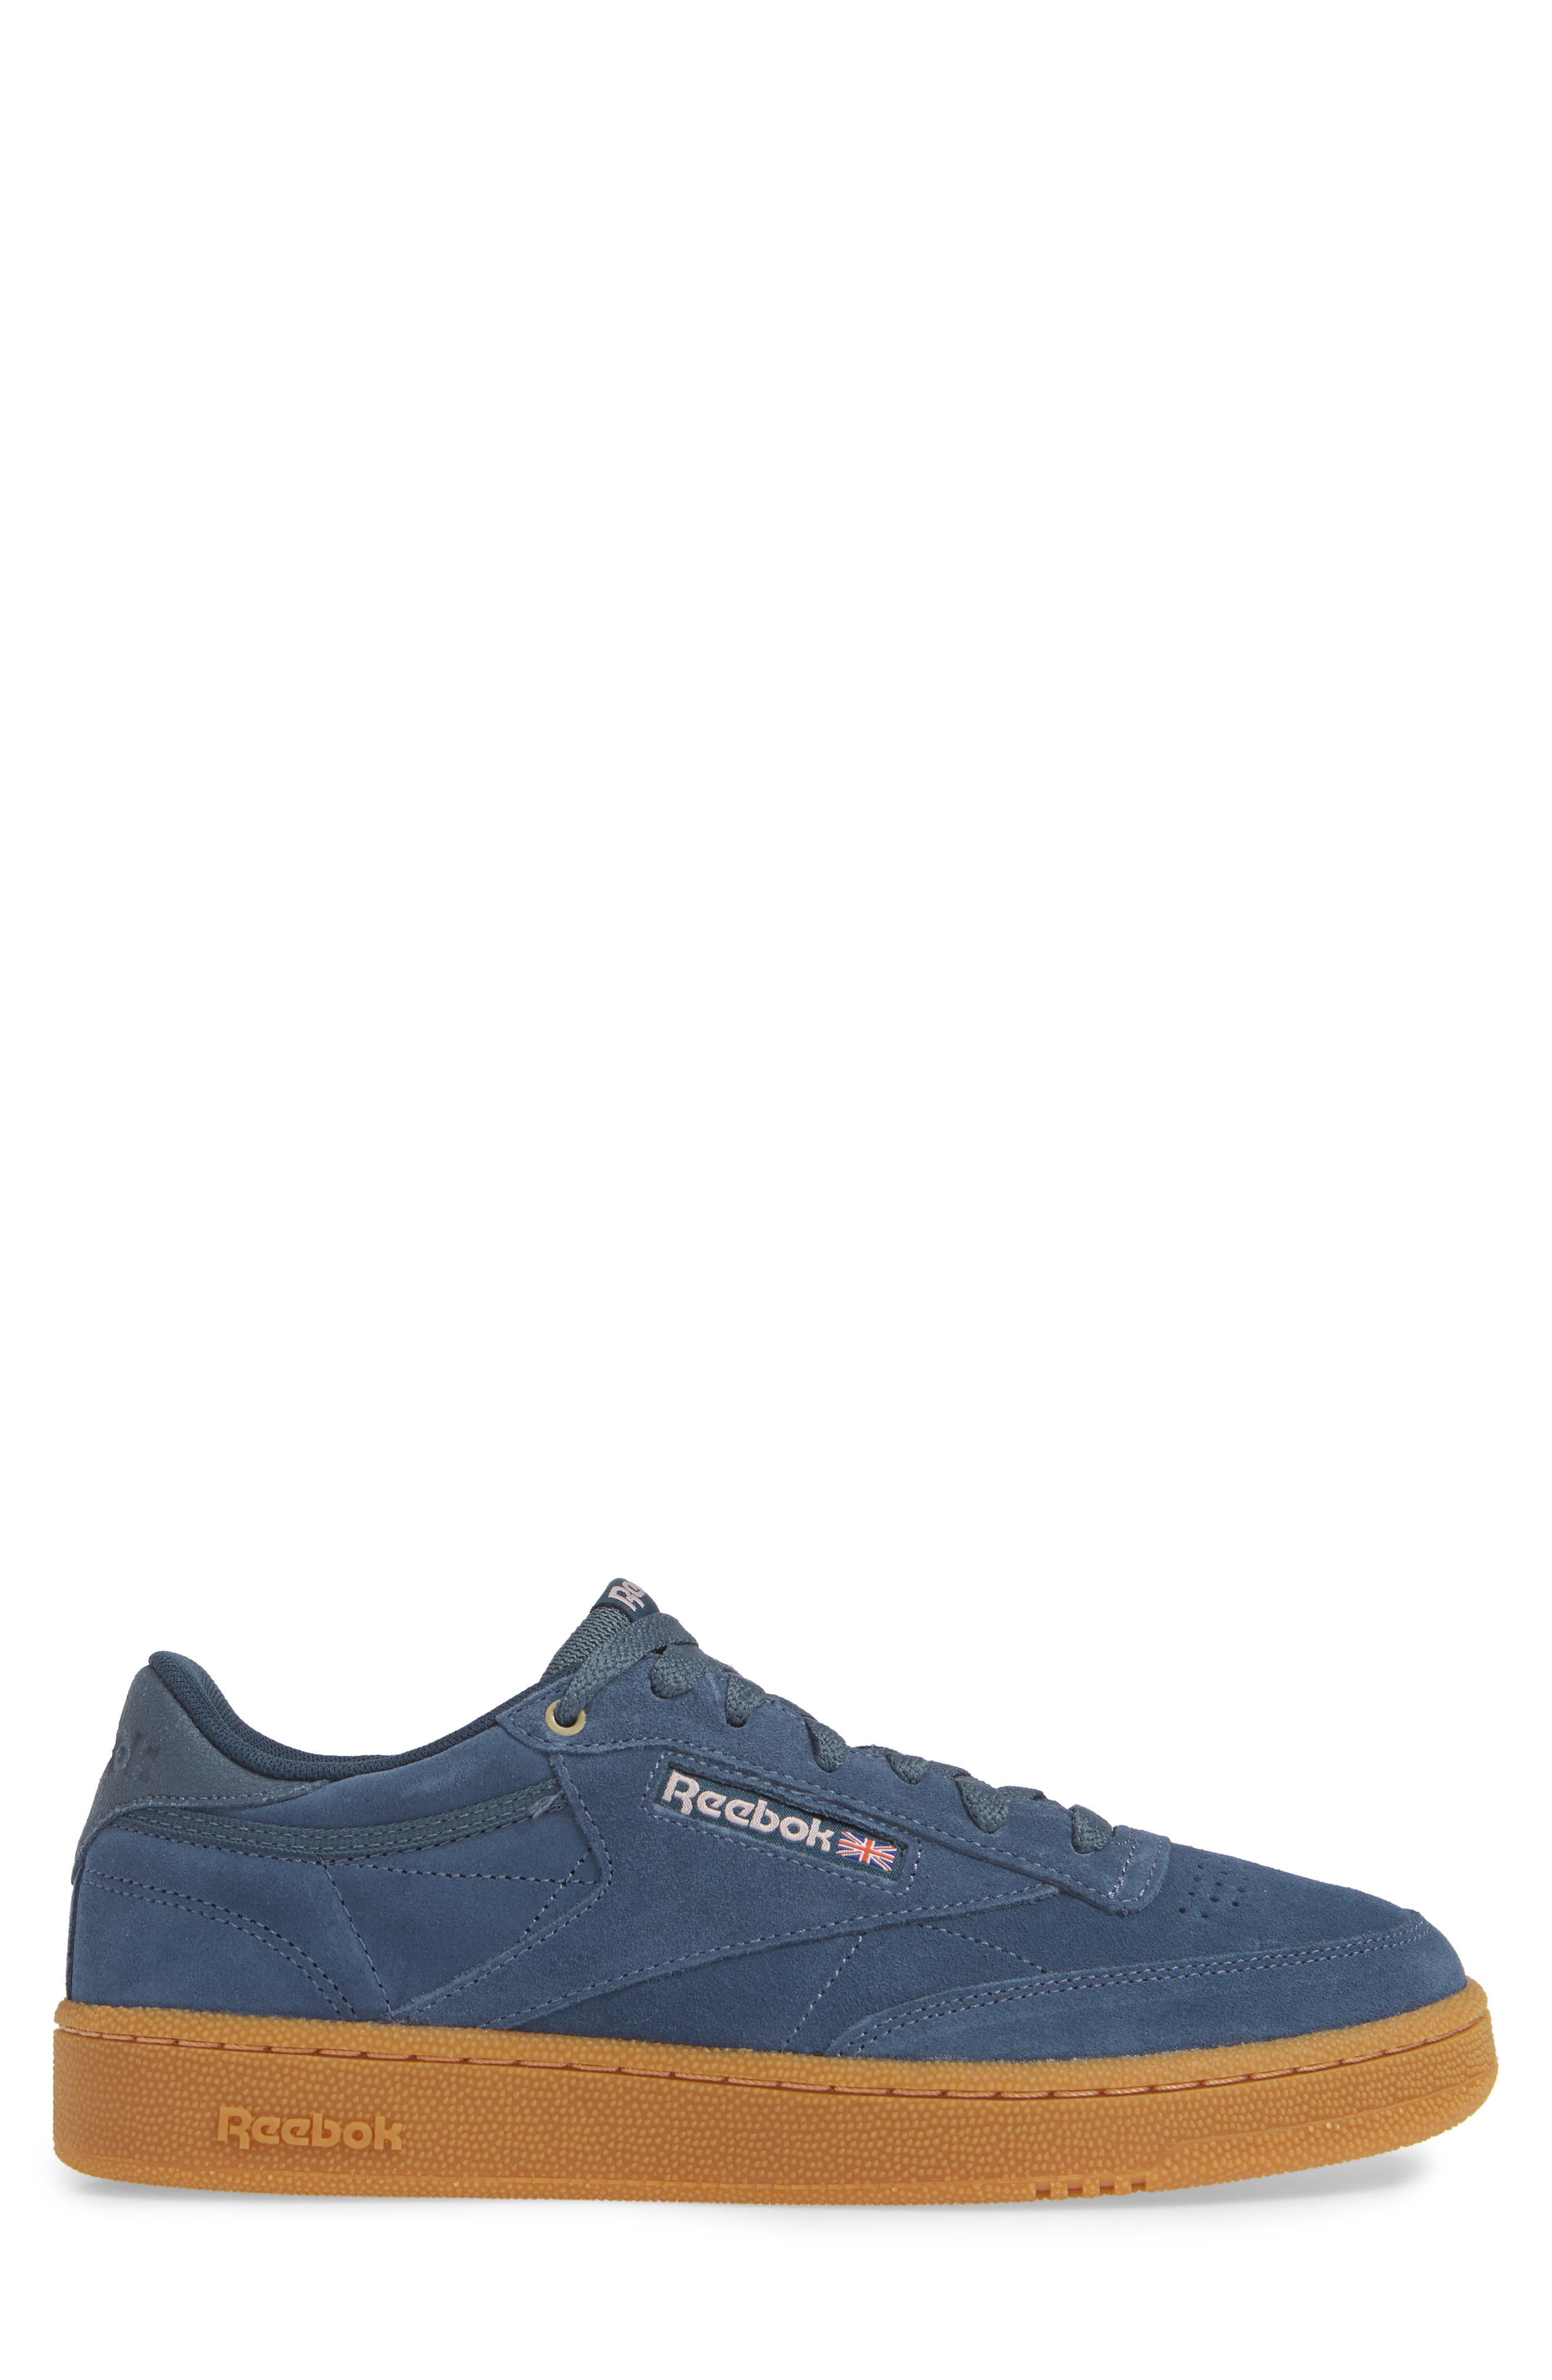 Club C 85 MU Sneaker,                             Alternate thumbnail 3, color,                             400